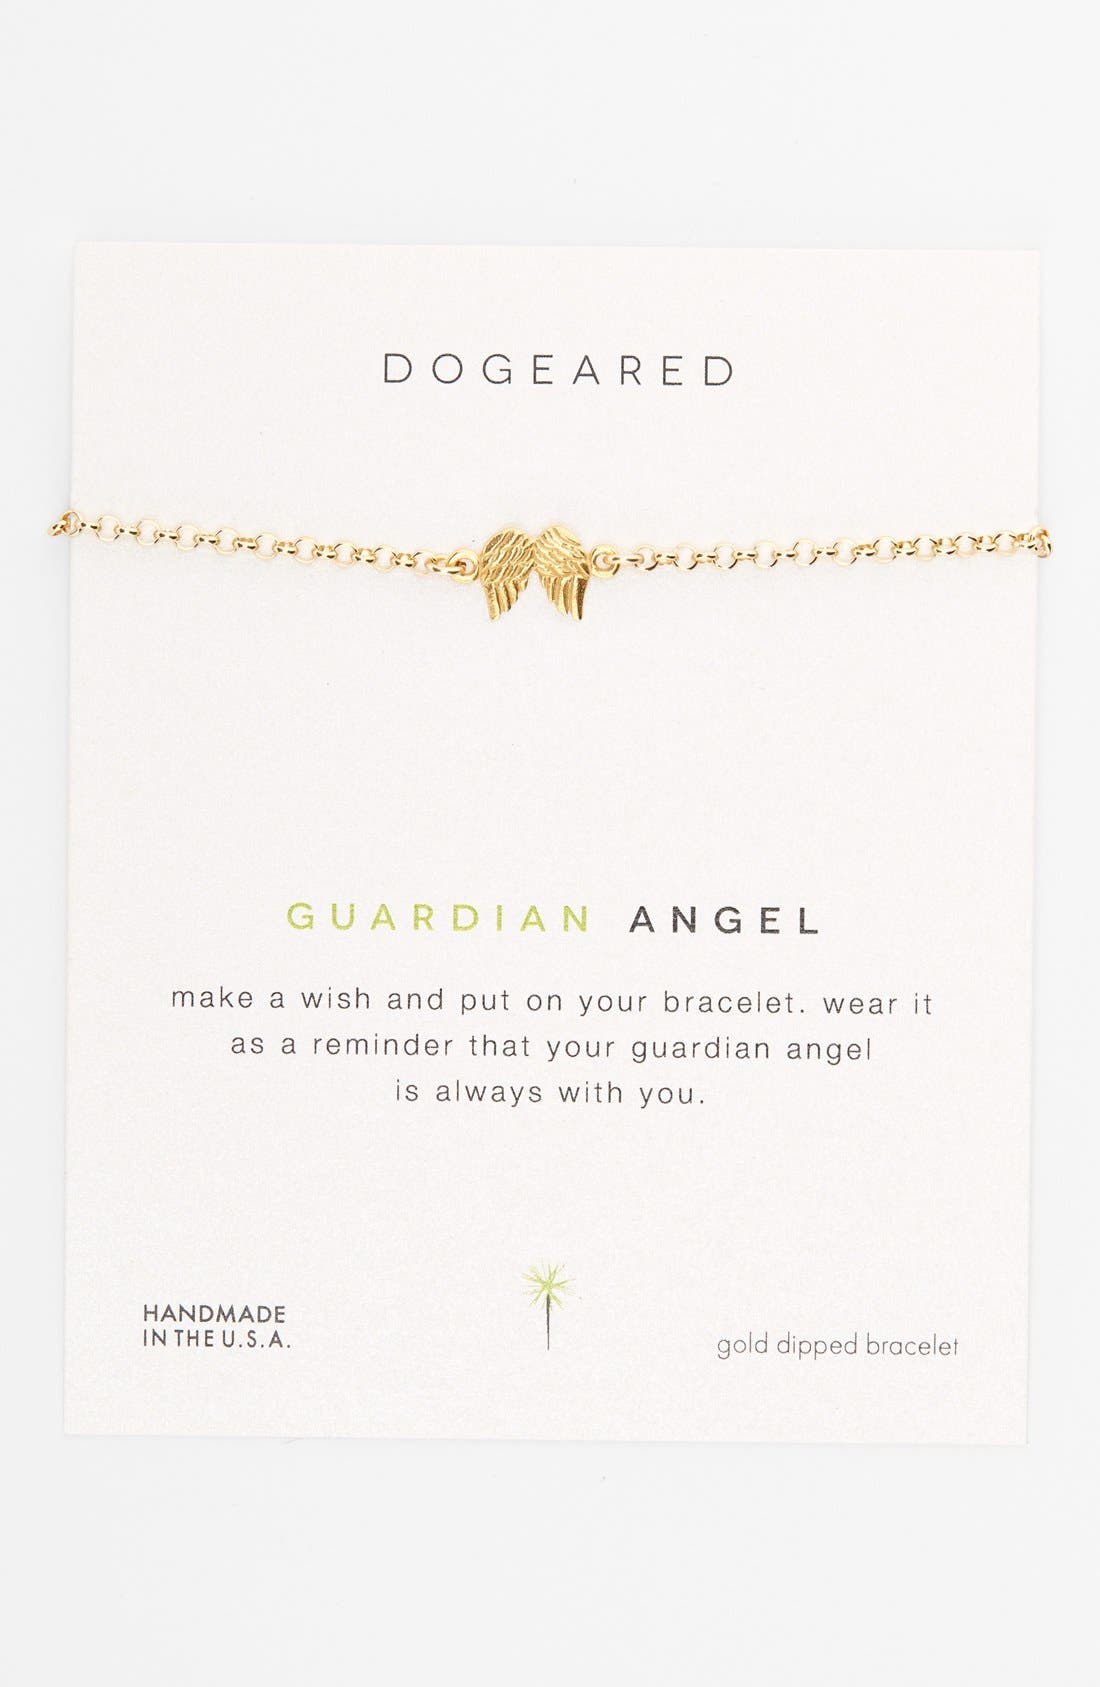 Alternate Image 1 Selected - Dogeared 'Reminder - Guardian Angel' Boxed Charm Bracelet